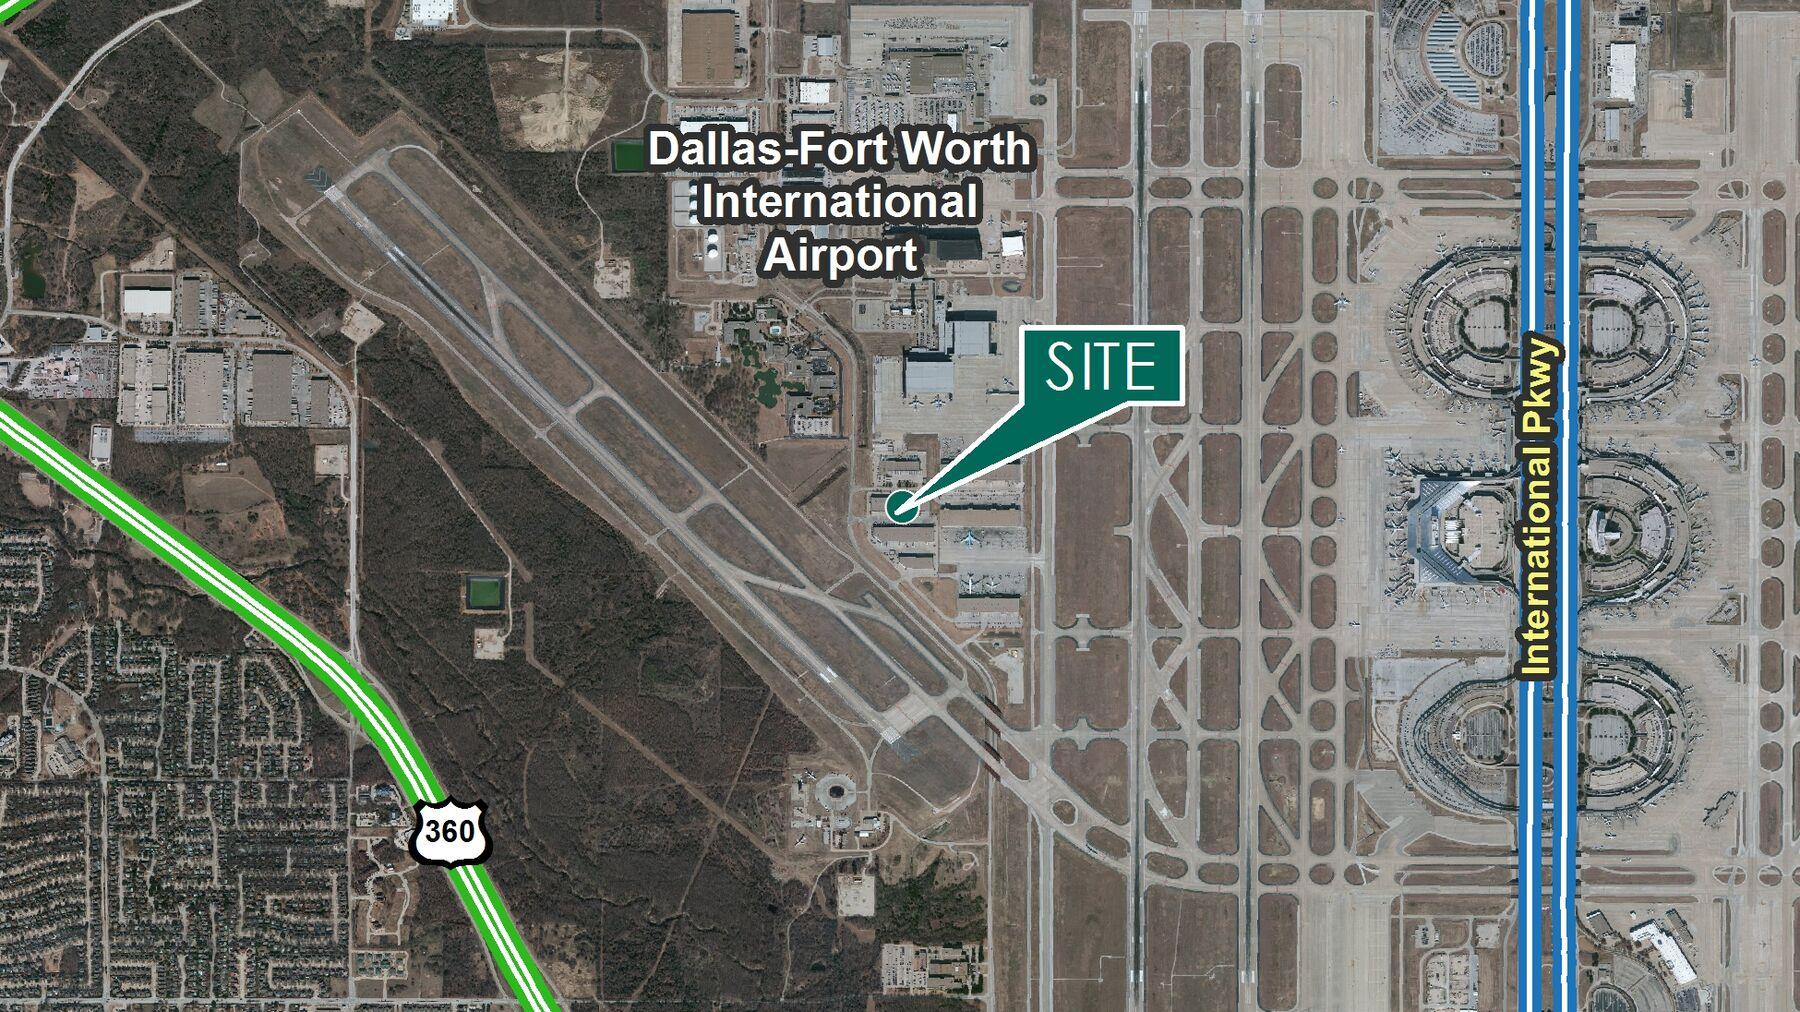 DPM-Prologis-DFW-6-DAL09306-2370-W-Airfield-Drive_AerialMap.jpg